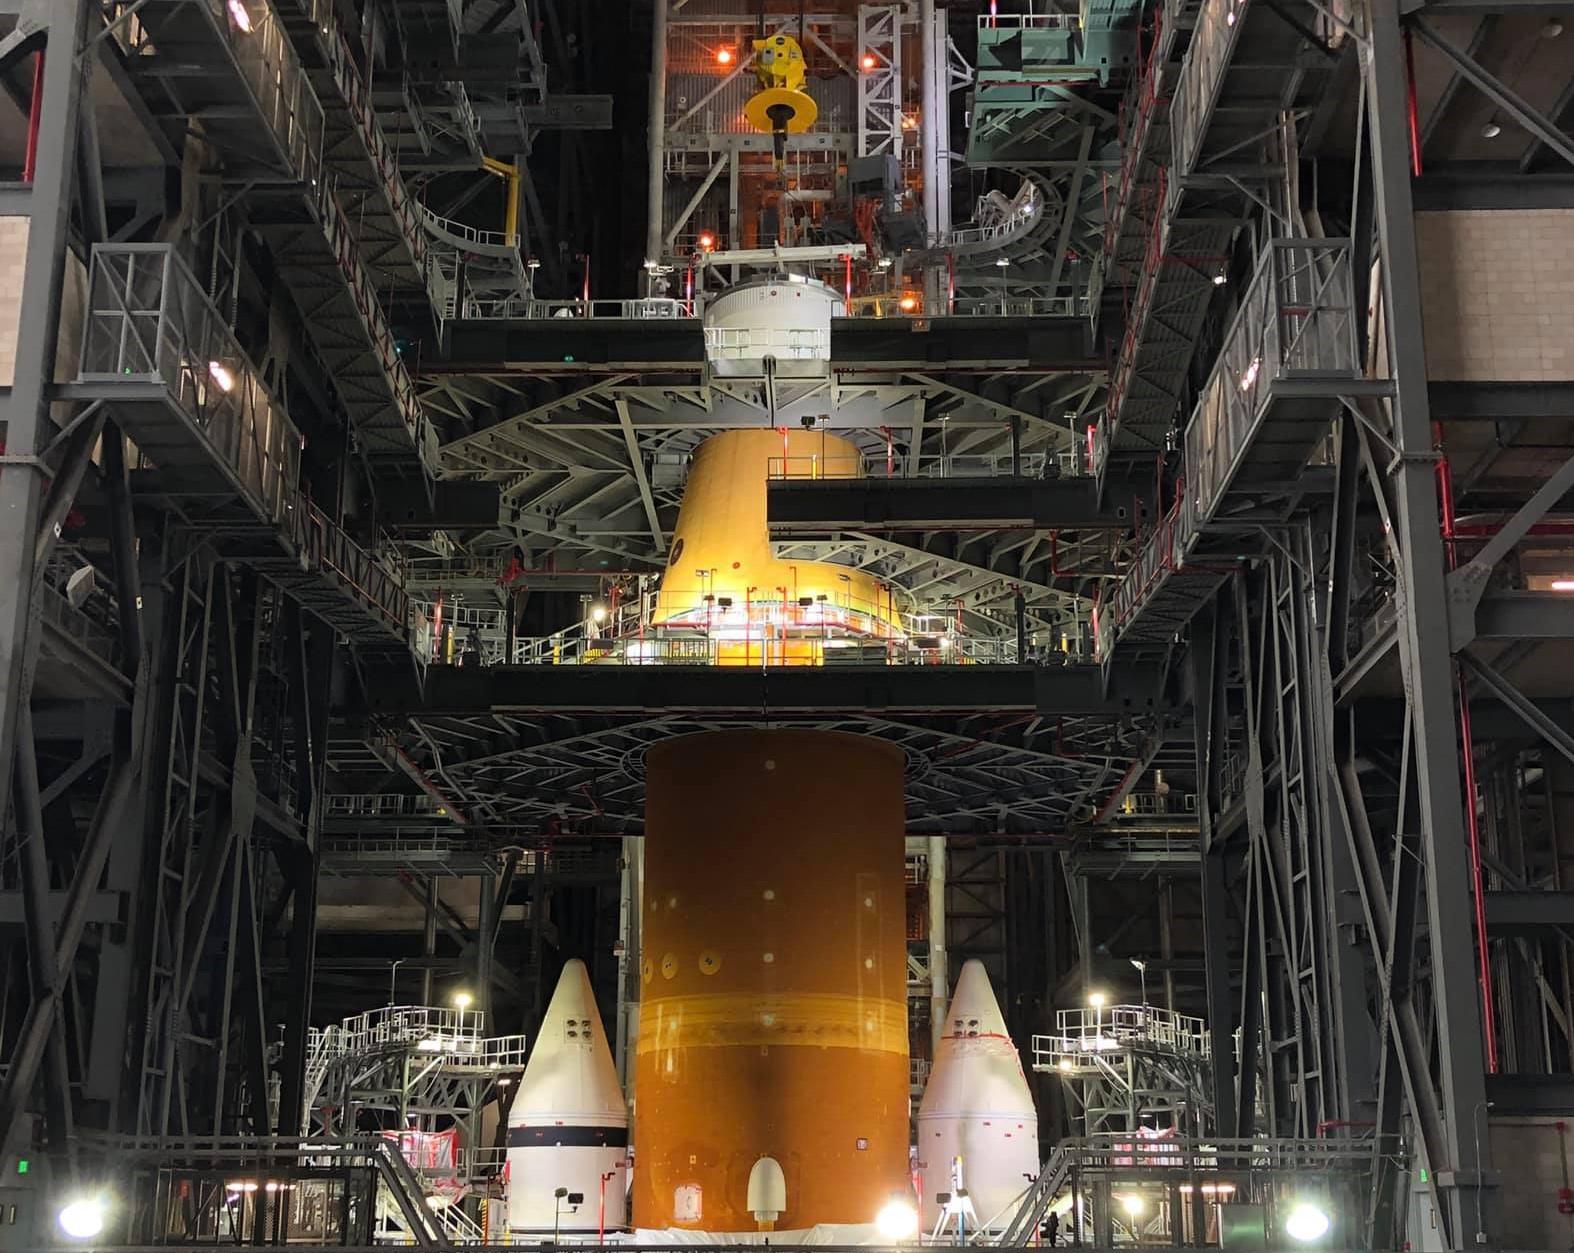 Big Build In Progress for NASA's 1st SLS Moon Rocket Inside VAB at Kennedy Space Center